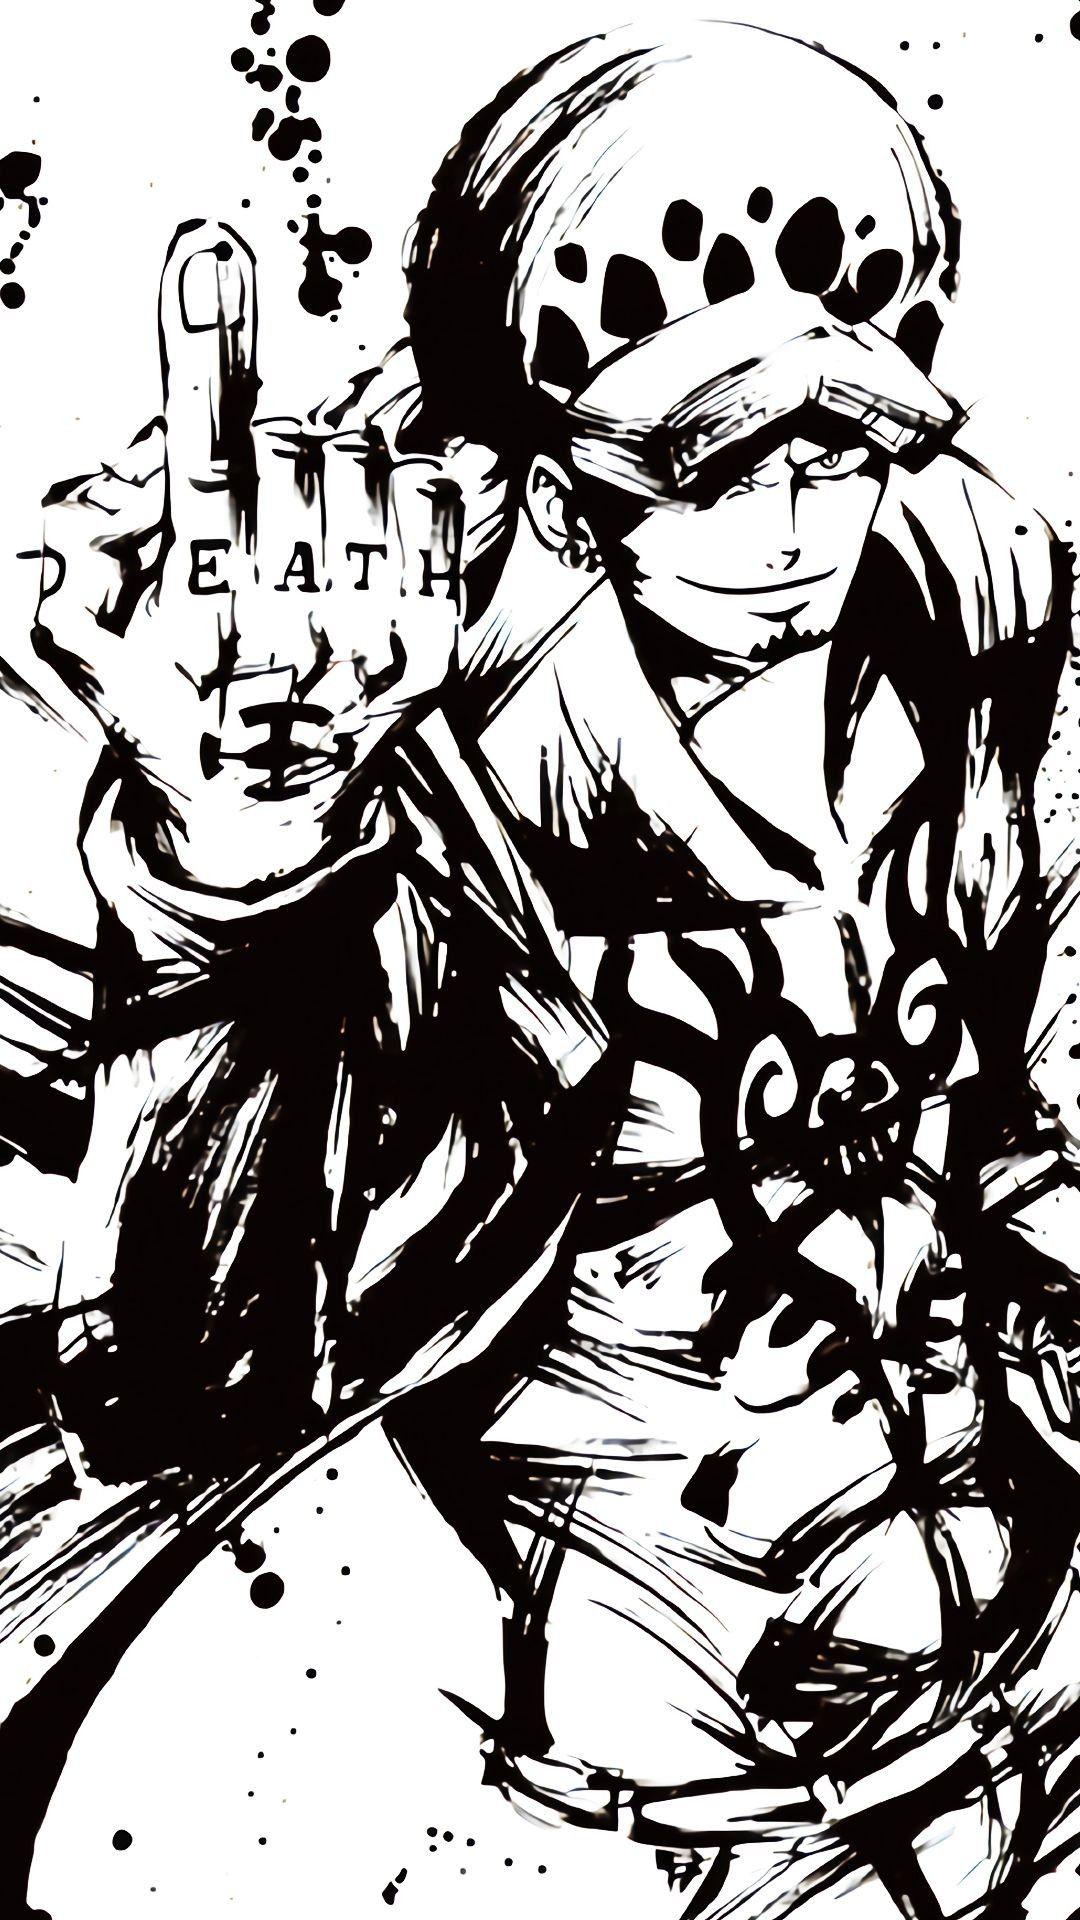 Iphone X Xr Xs 6 7 8 Plus Flexible Slim Tpu Protector Cover Pirate Trafalgar Law One Piece Wallpaper Iphone One Piece Drawing One Piece Tattoos